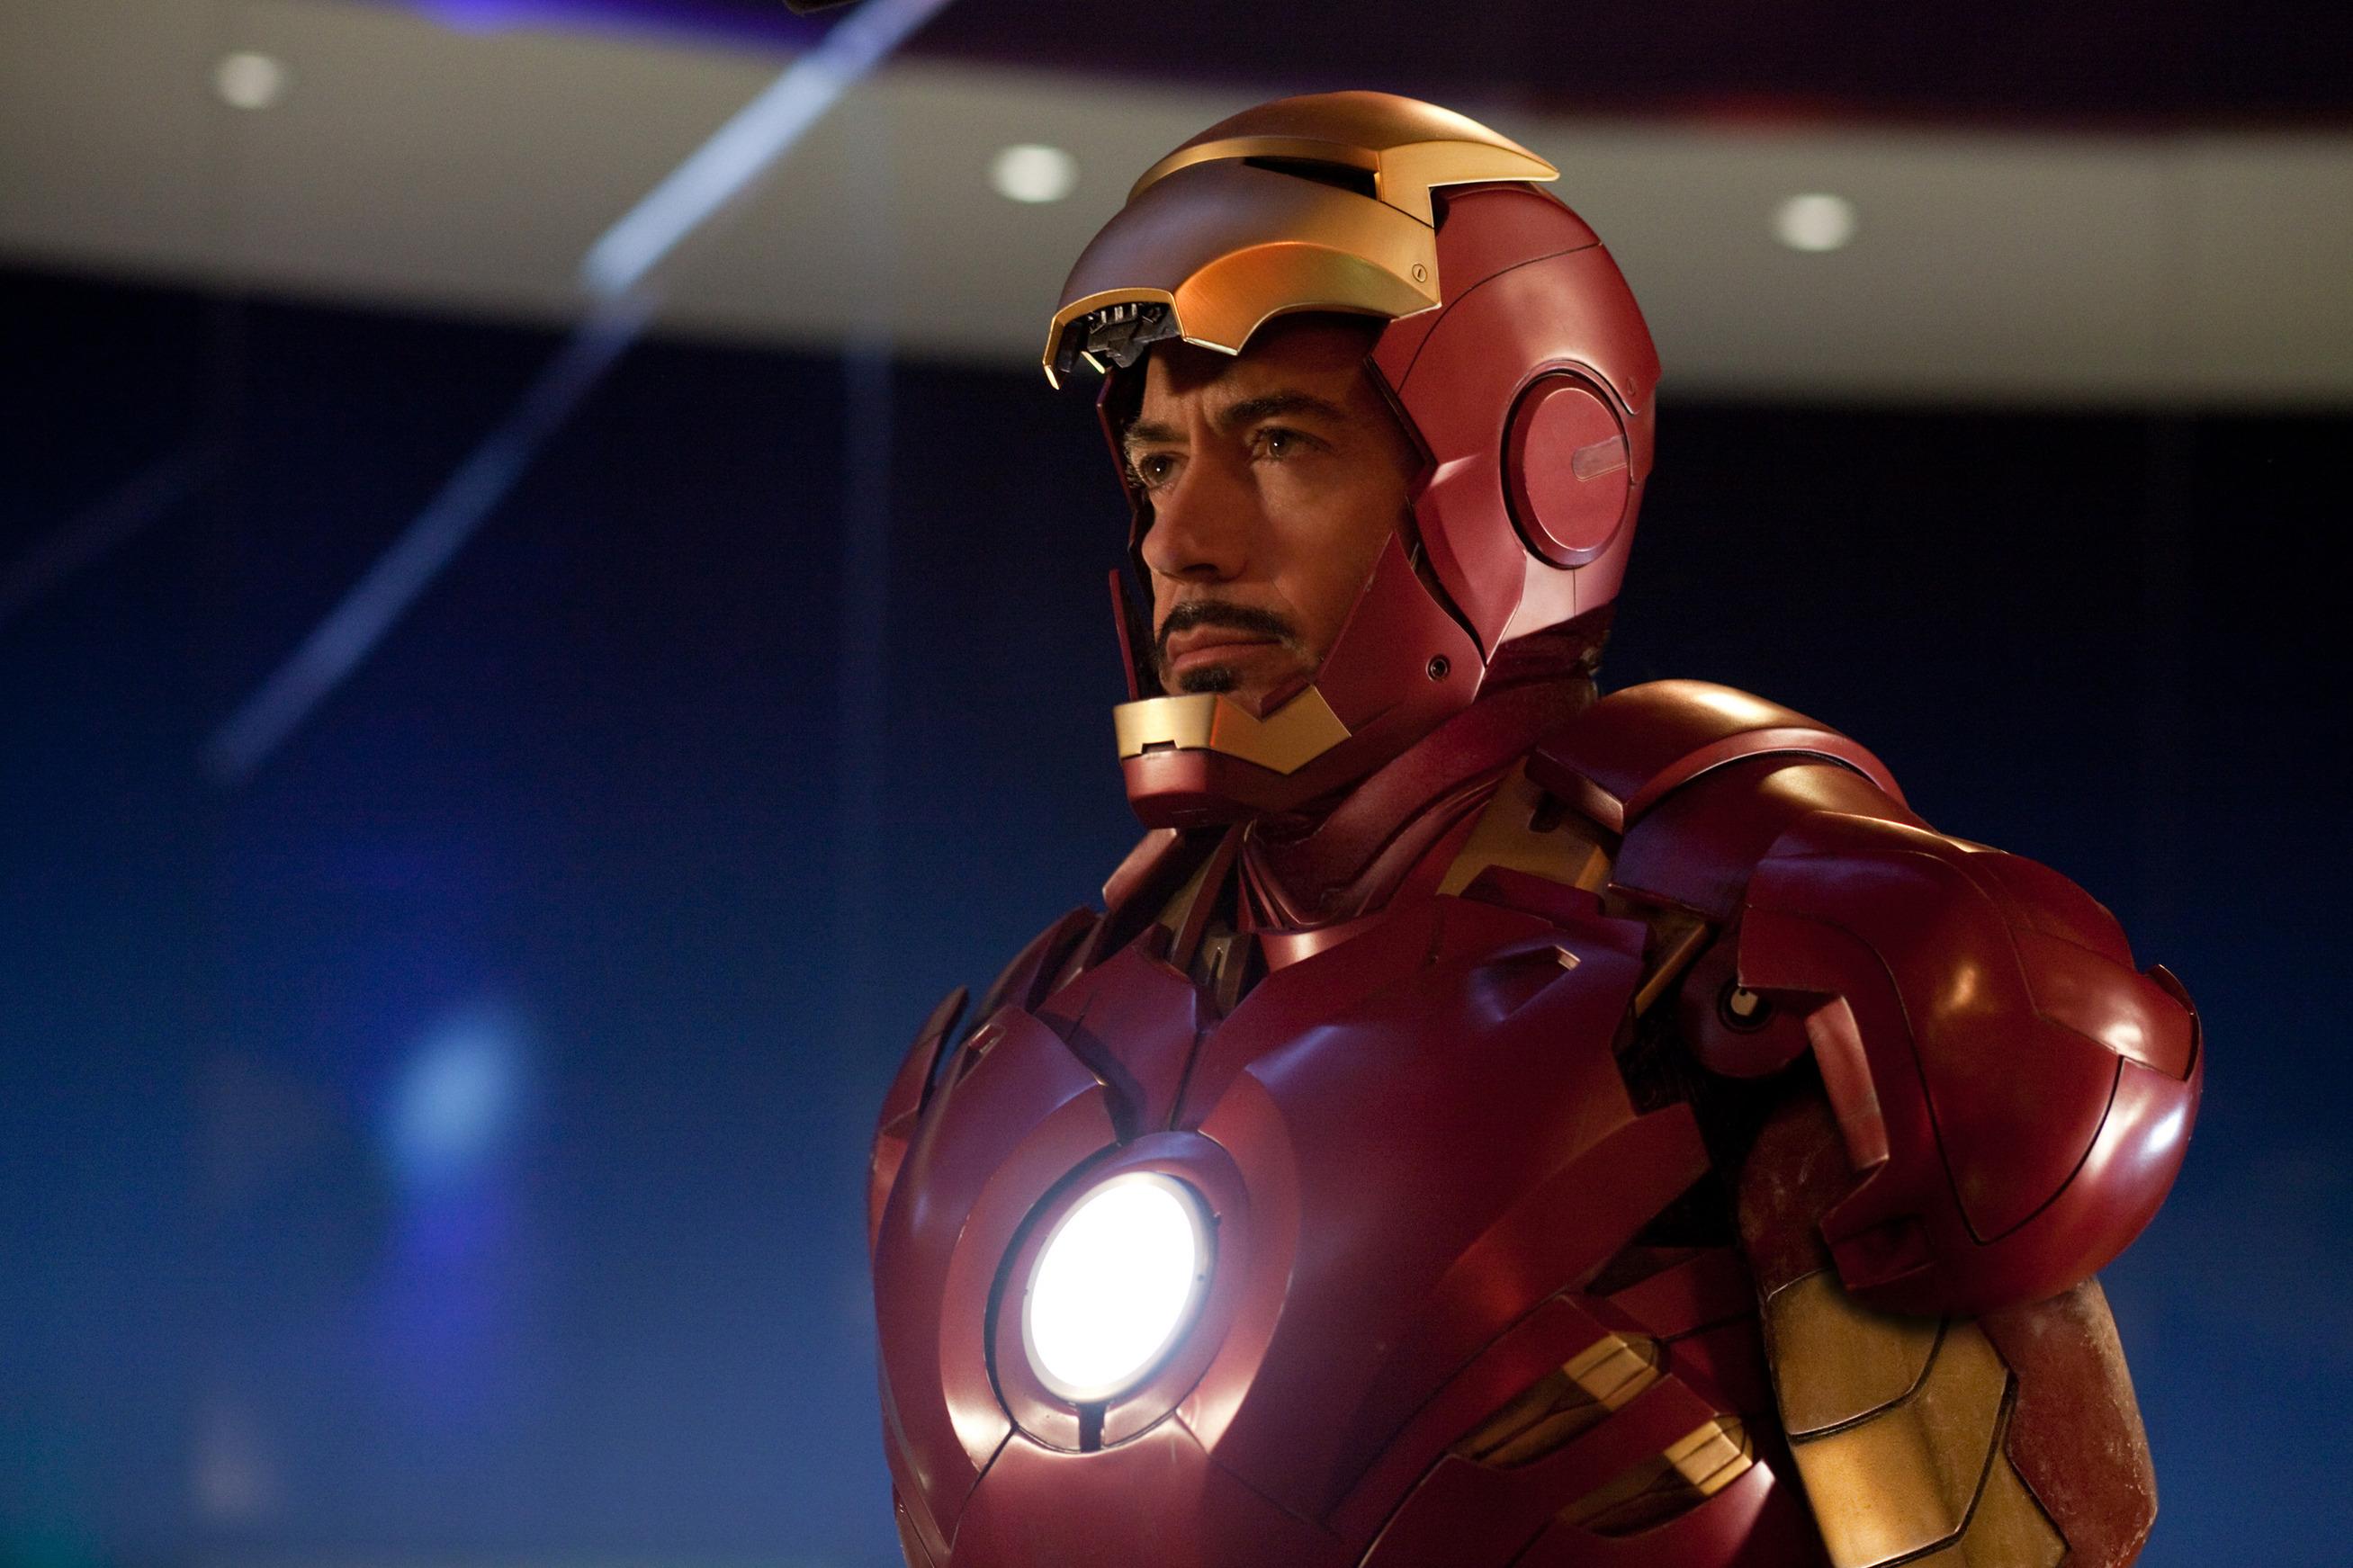 Robert_Downey_Jr_Iron_Man.jpg